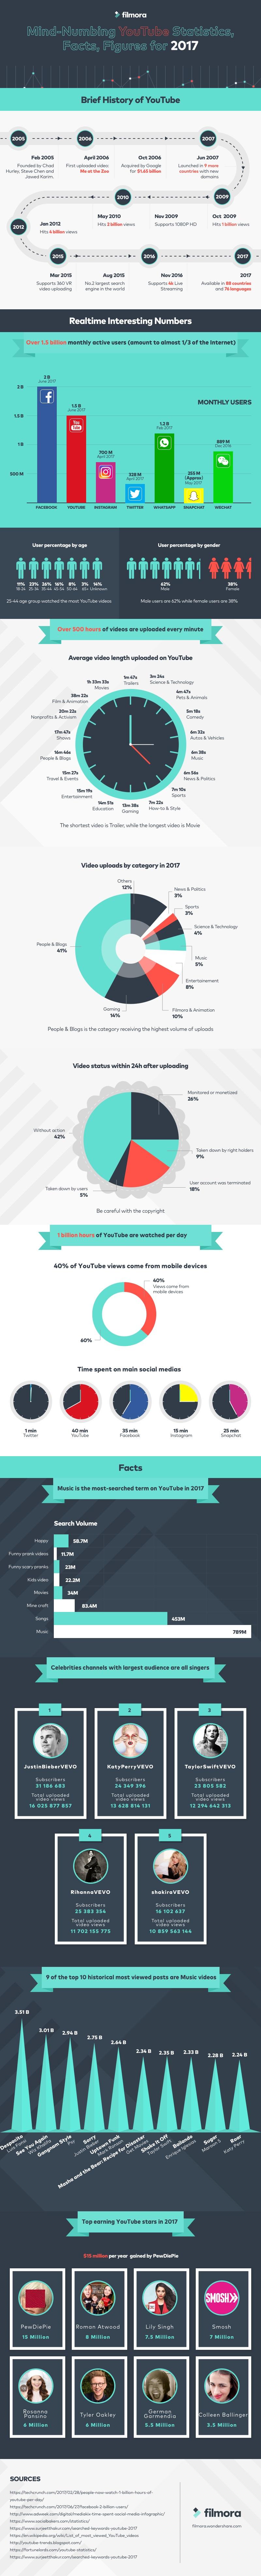 Datos muy interesantes sobre YouTube